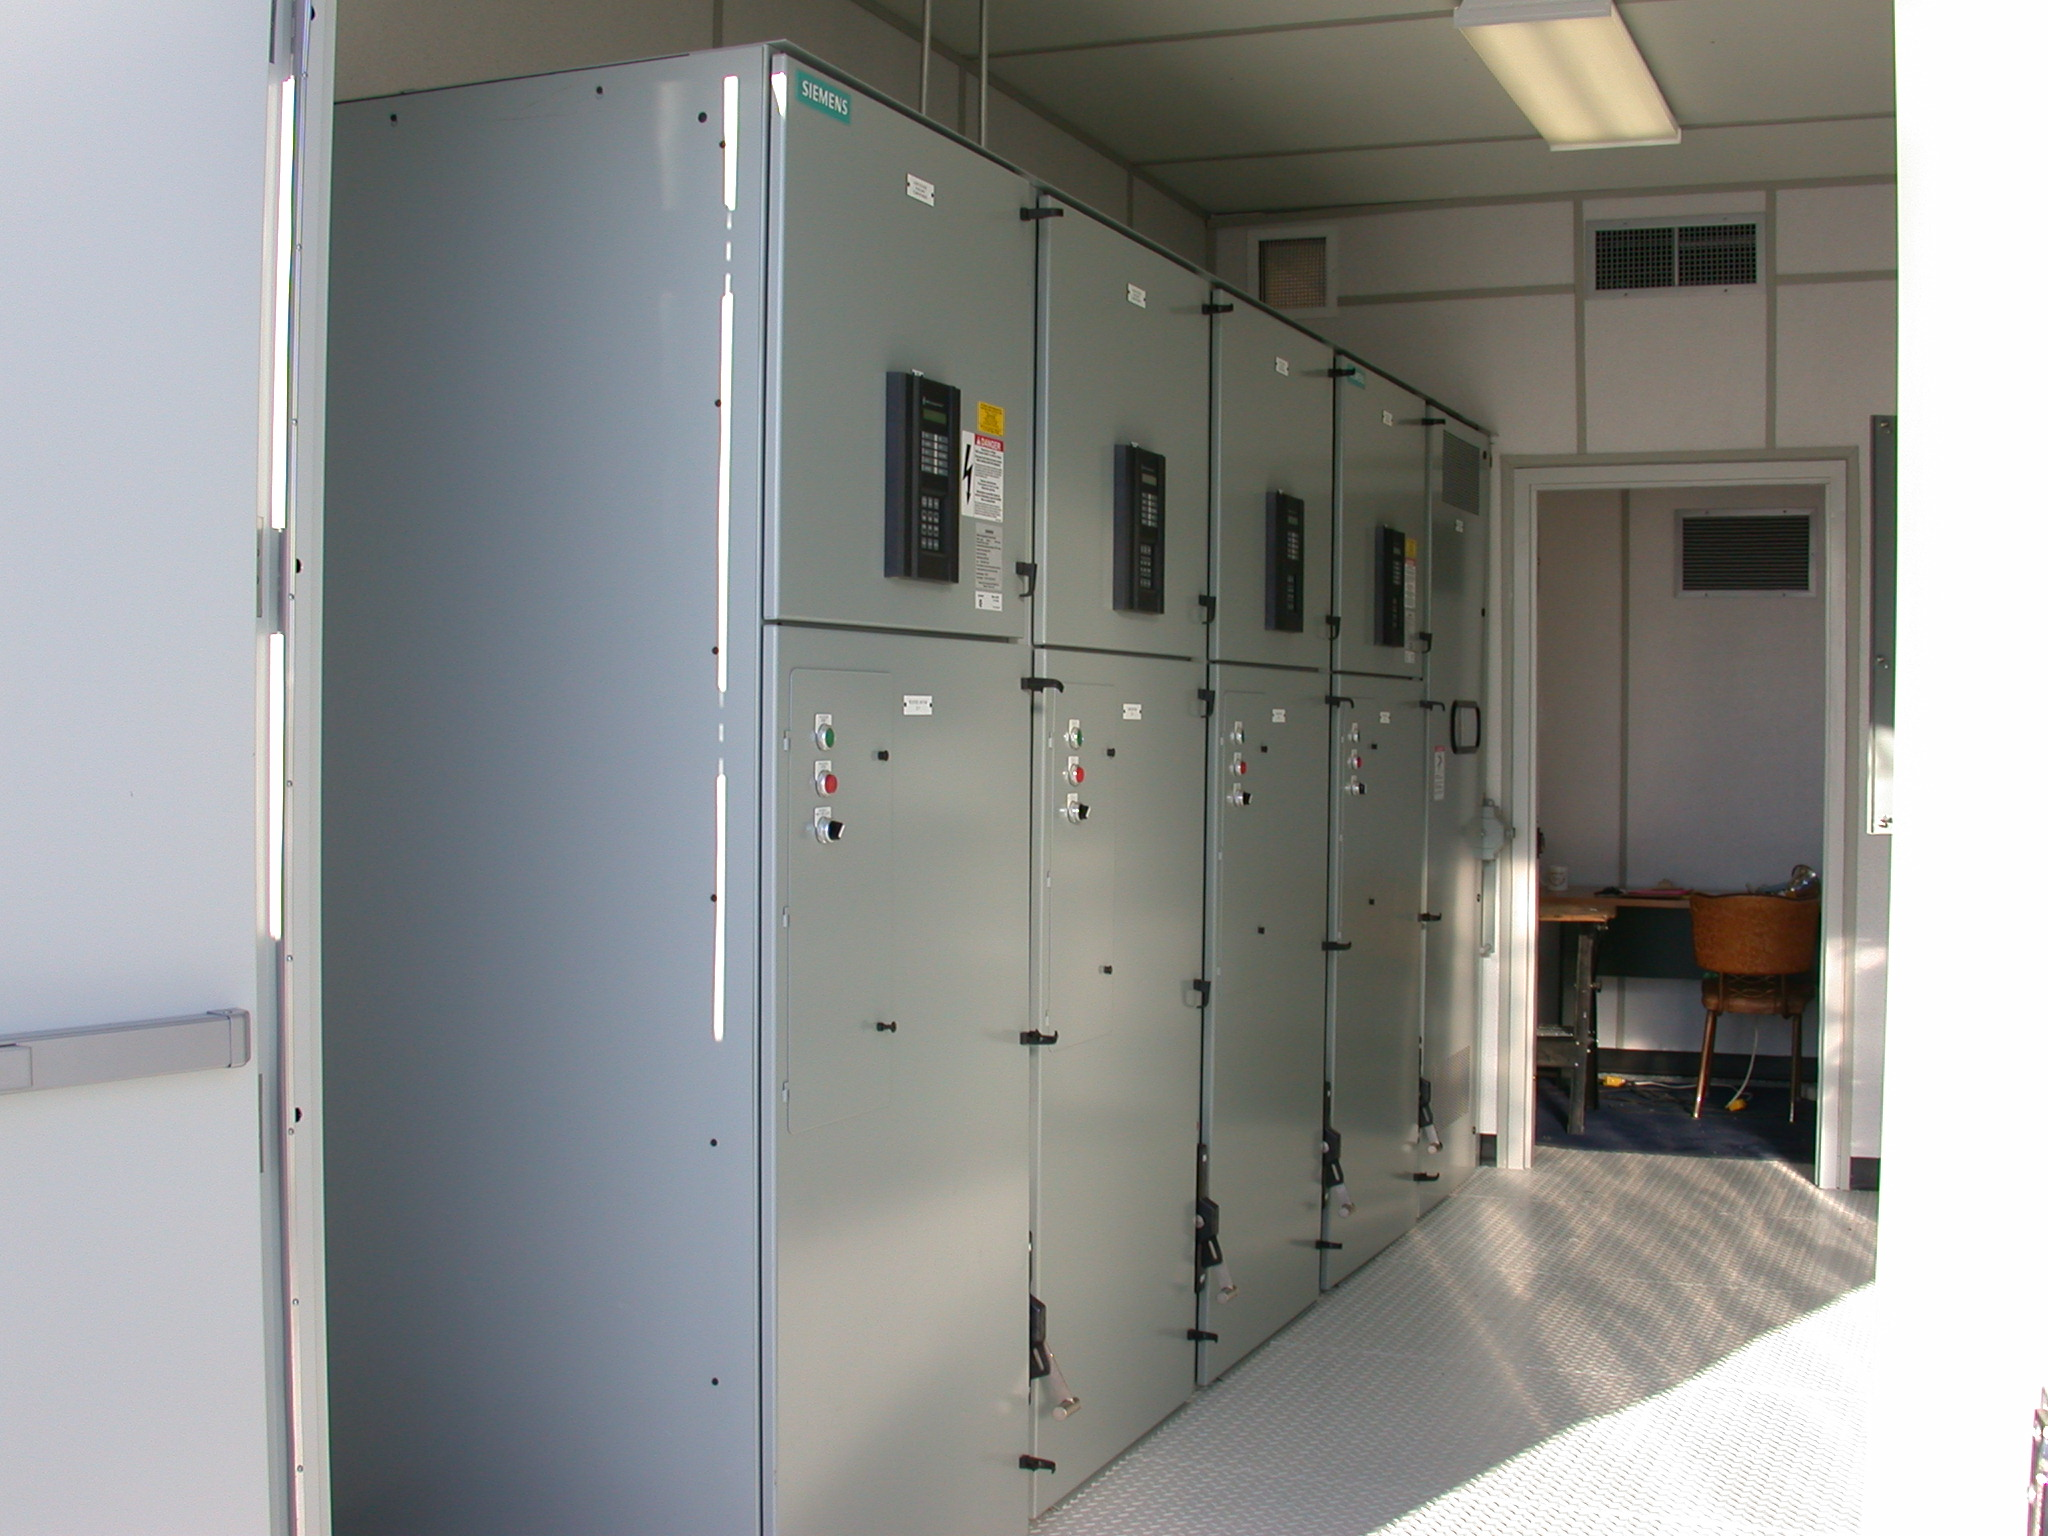 Interior of Control Room